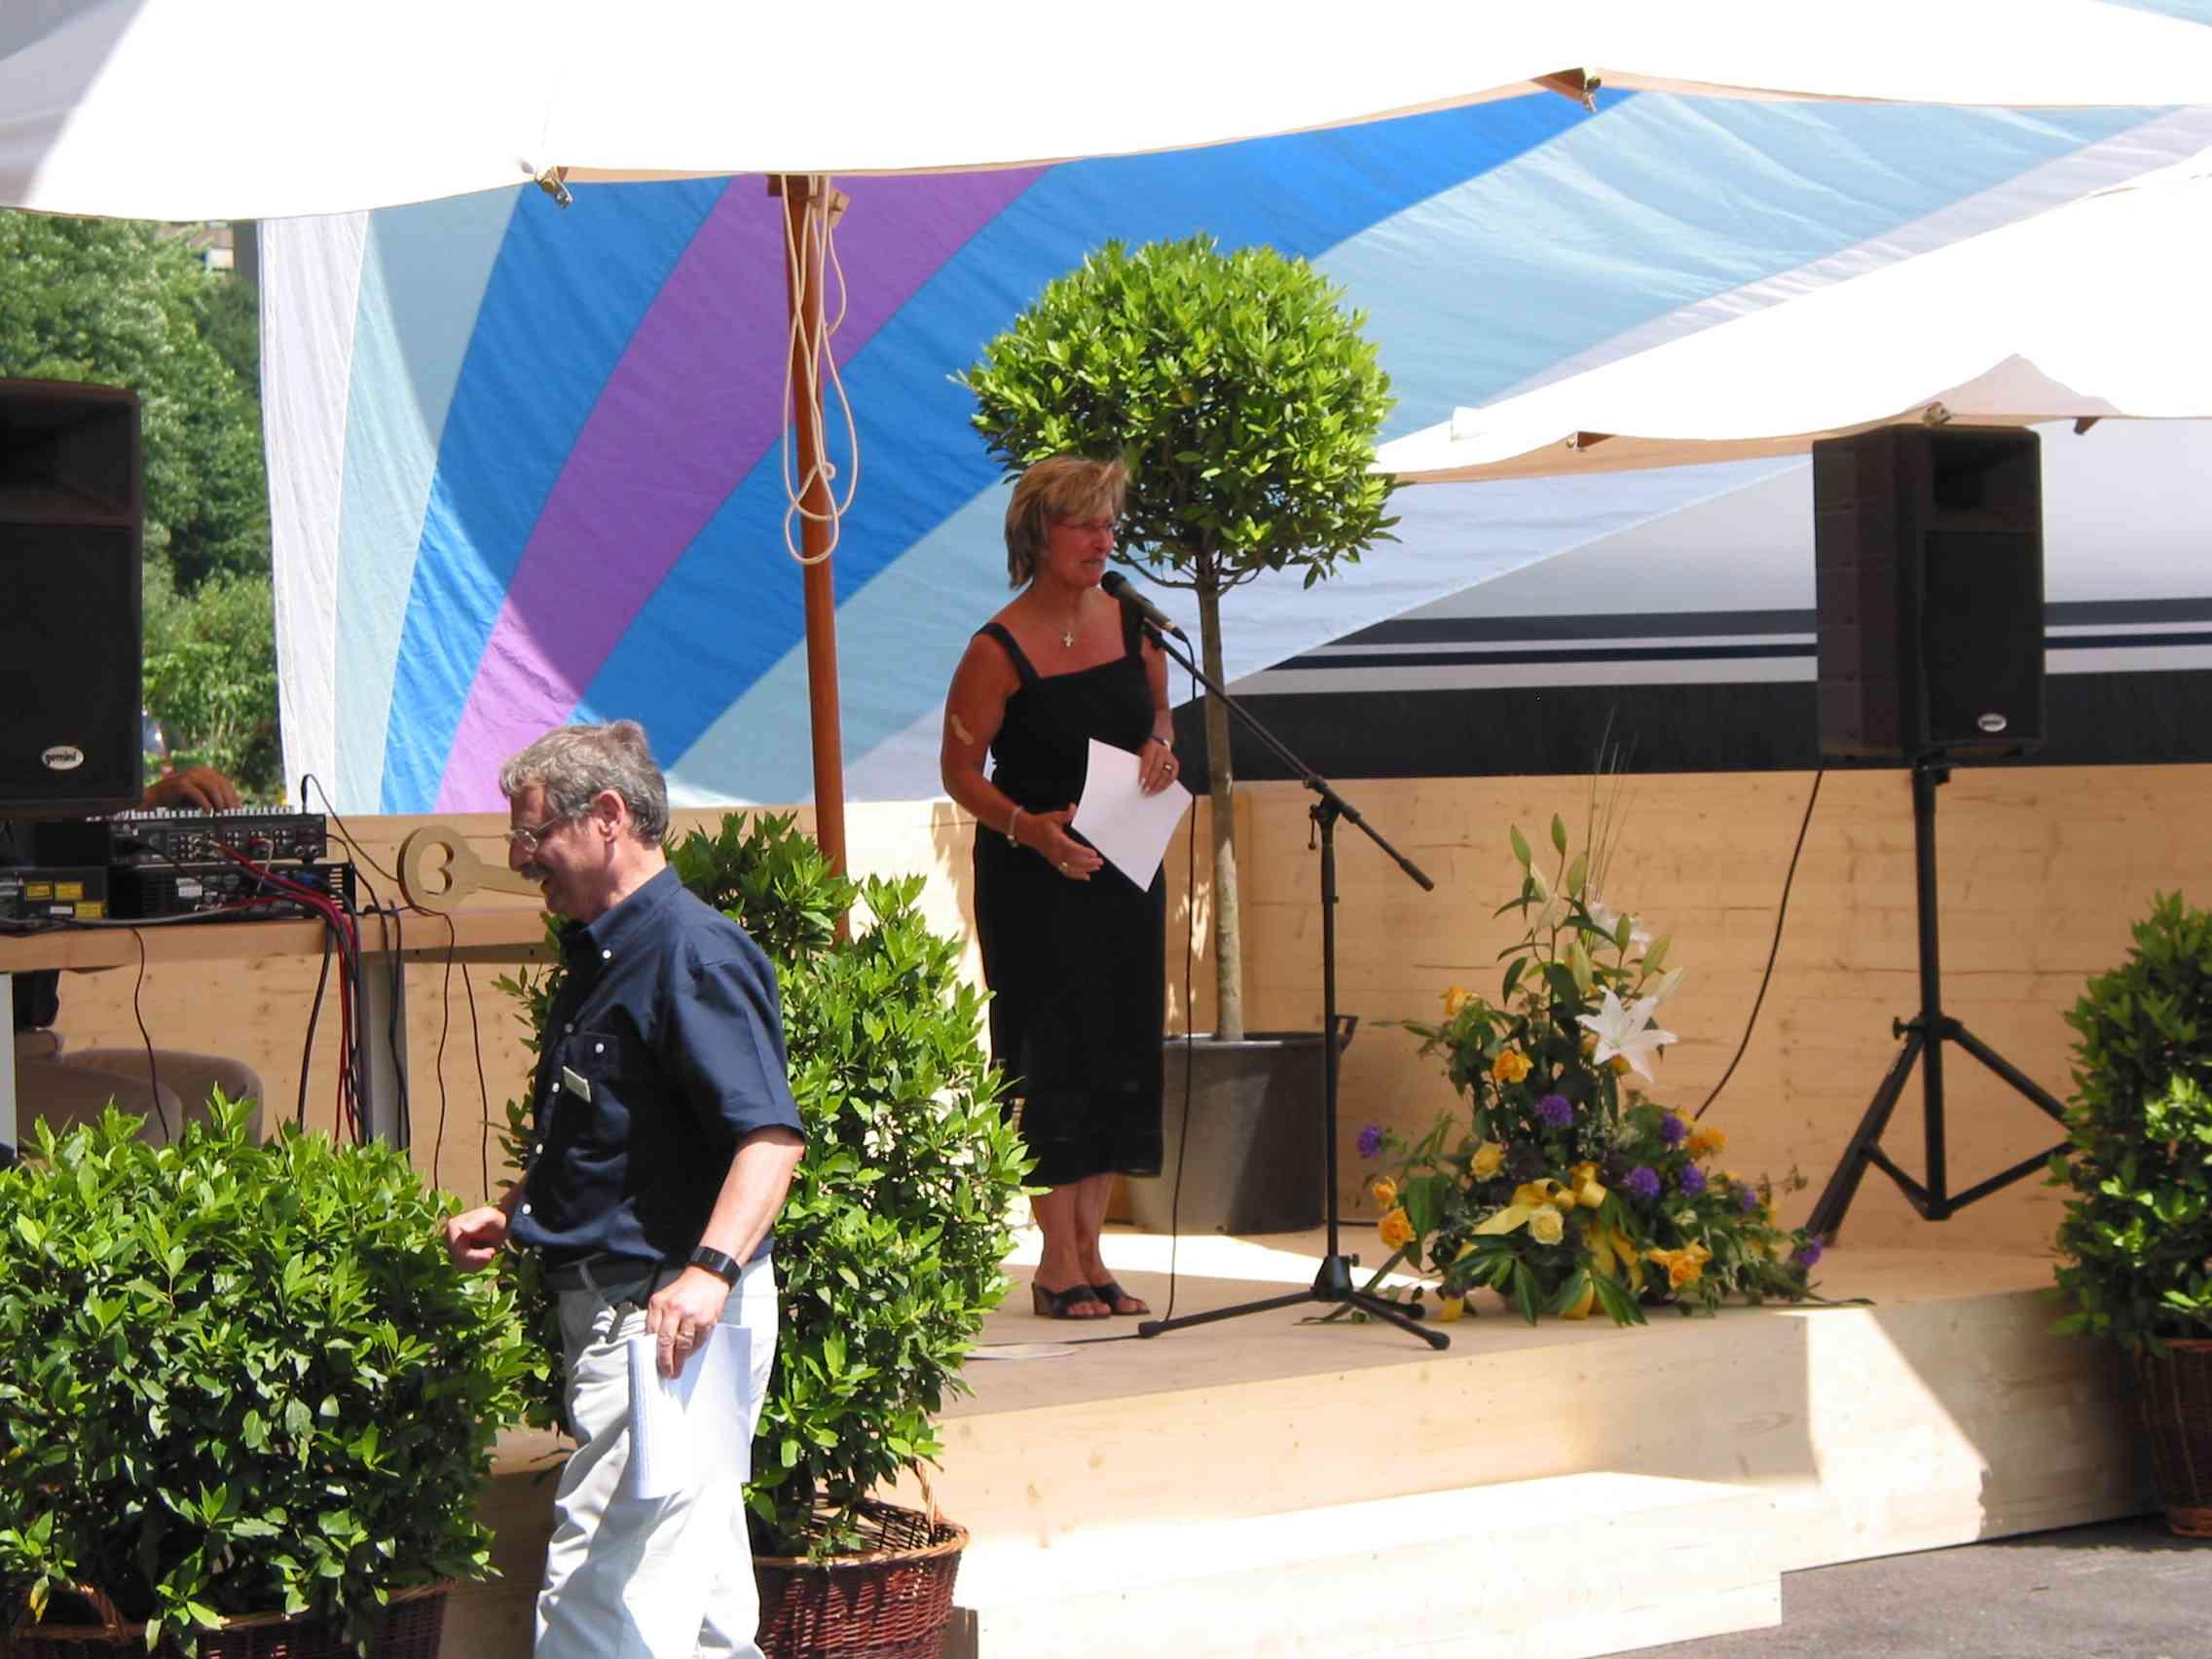 Frau Bezirksammann Brigitte Camenzind fand ebenfalls lobende Worte zur Marina Fallenbach.